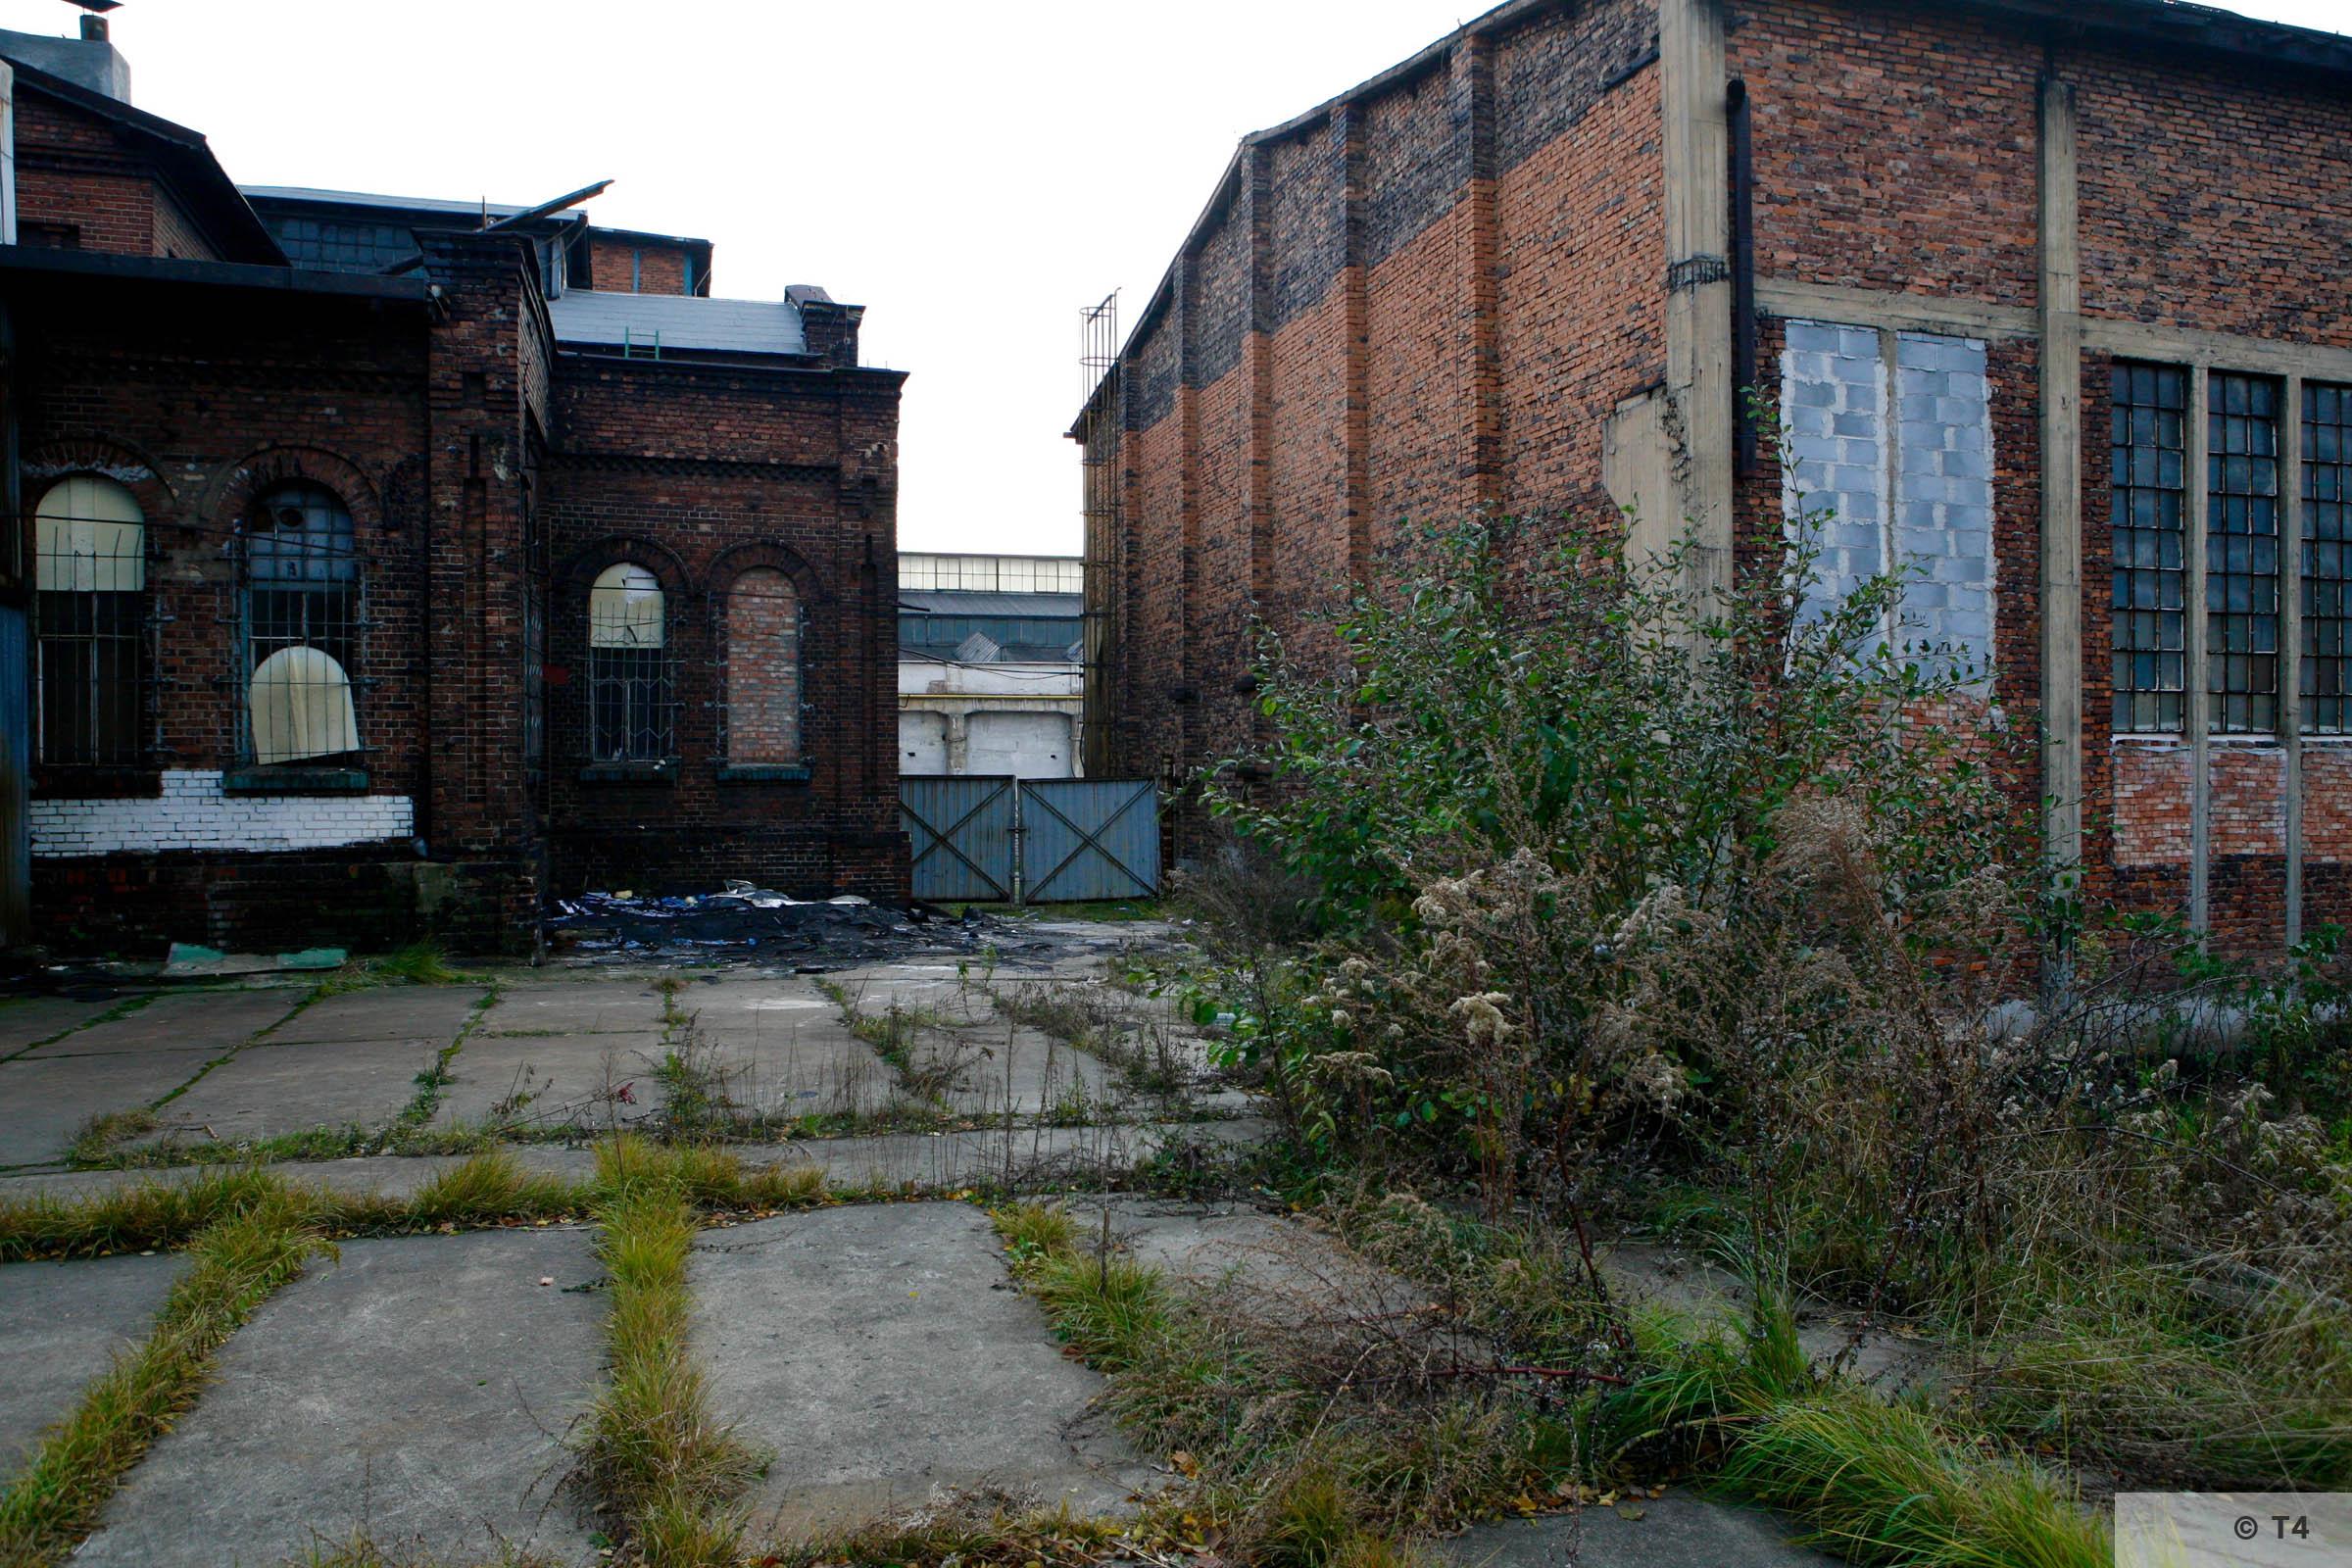 Zygmunt steel works. Production halls. 2006 T4 4751